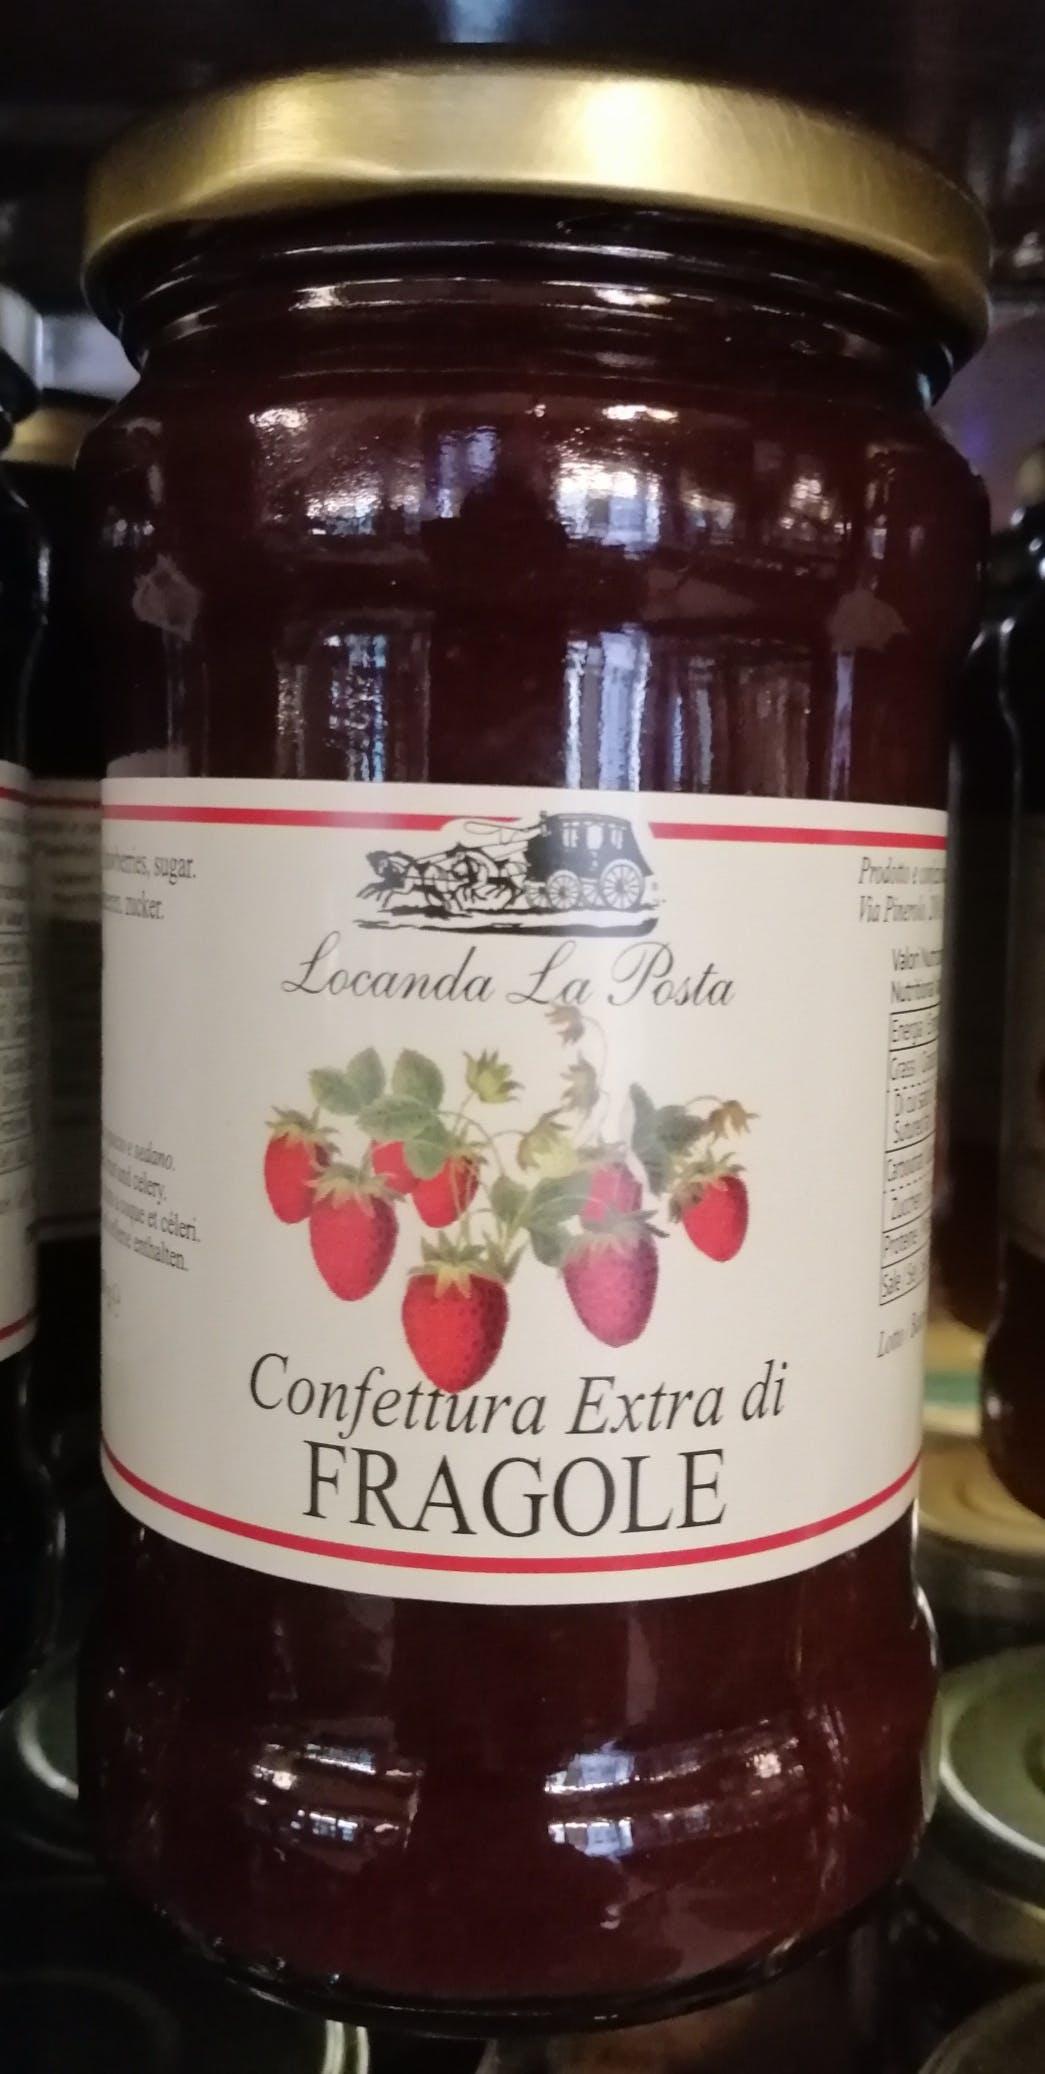 Fragole, Confettura extra